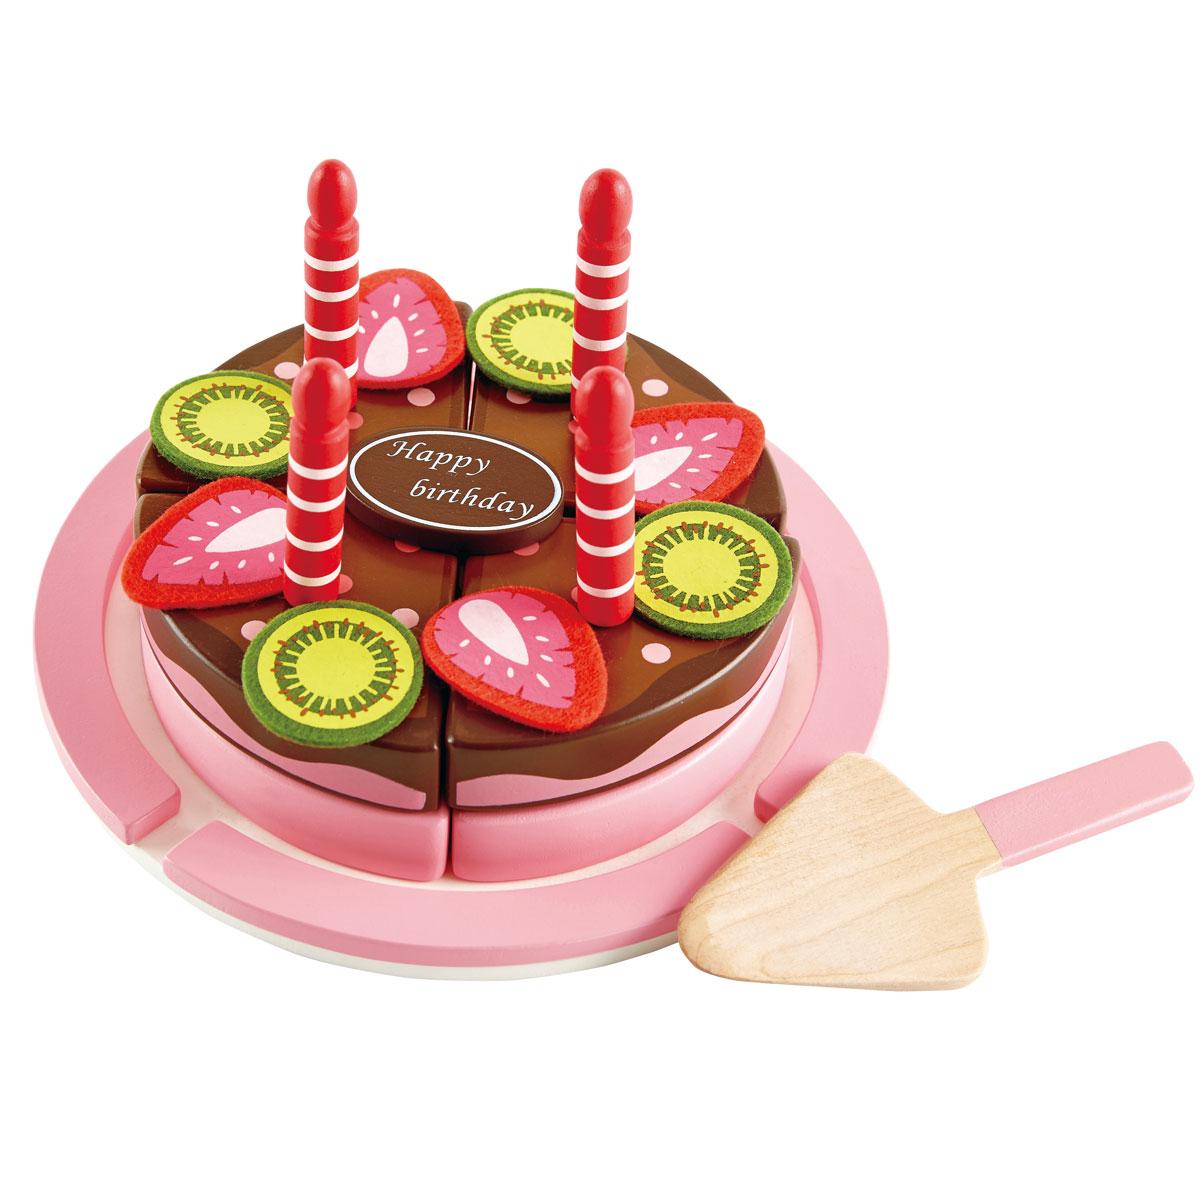 Torta de frutas con velcro